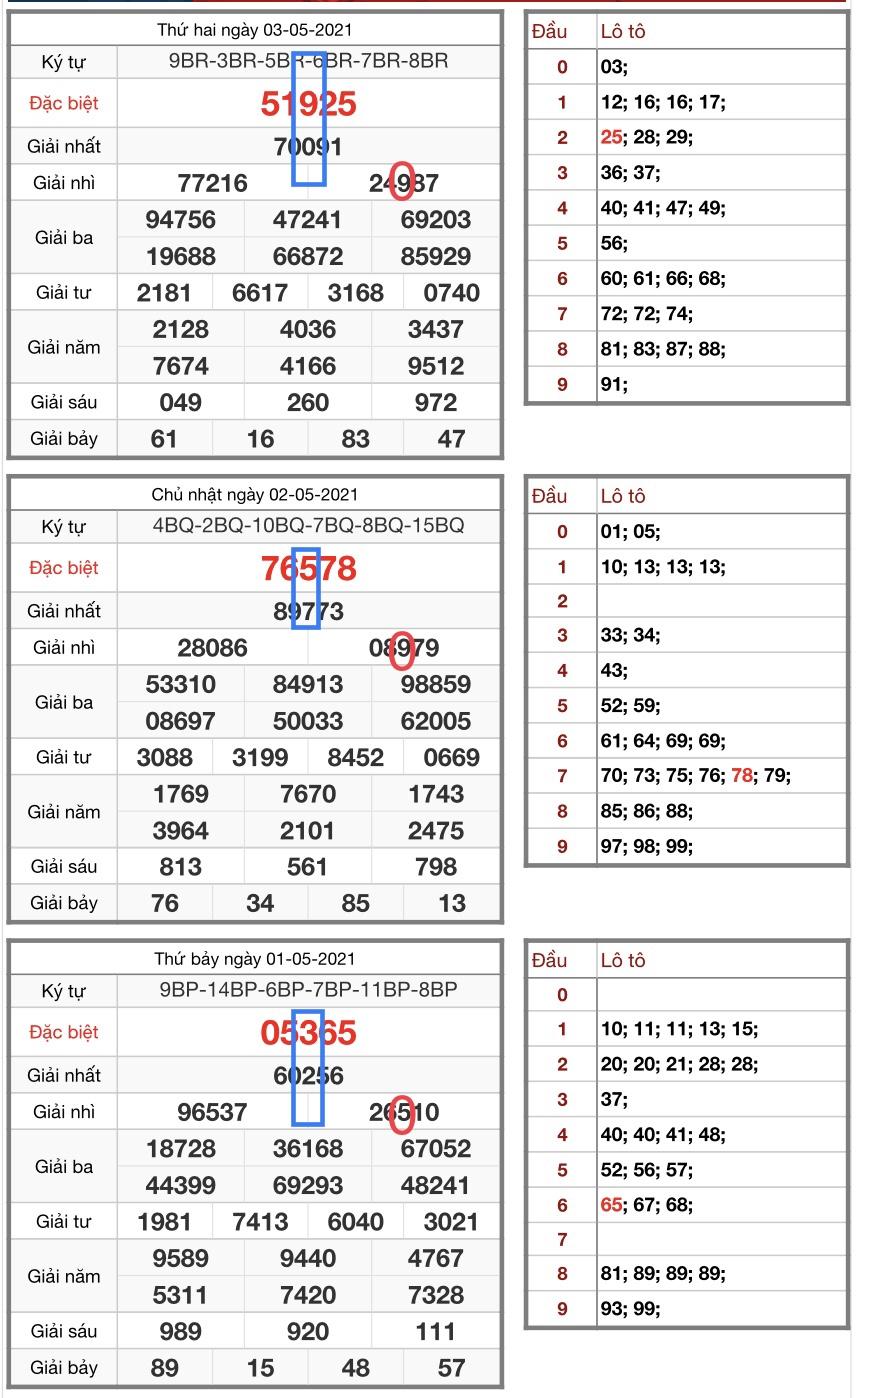 44F5069C-9C86-4322-9923-7A3EE4ACE380.jpeg